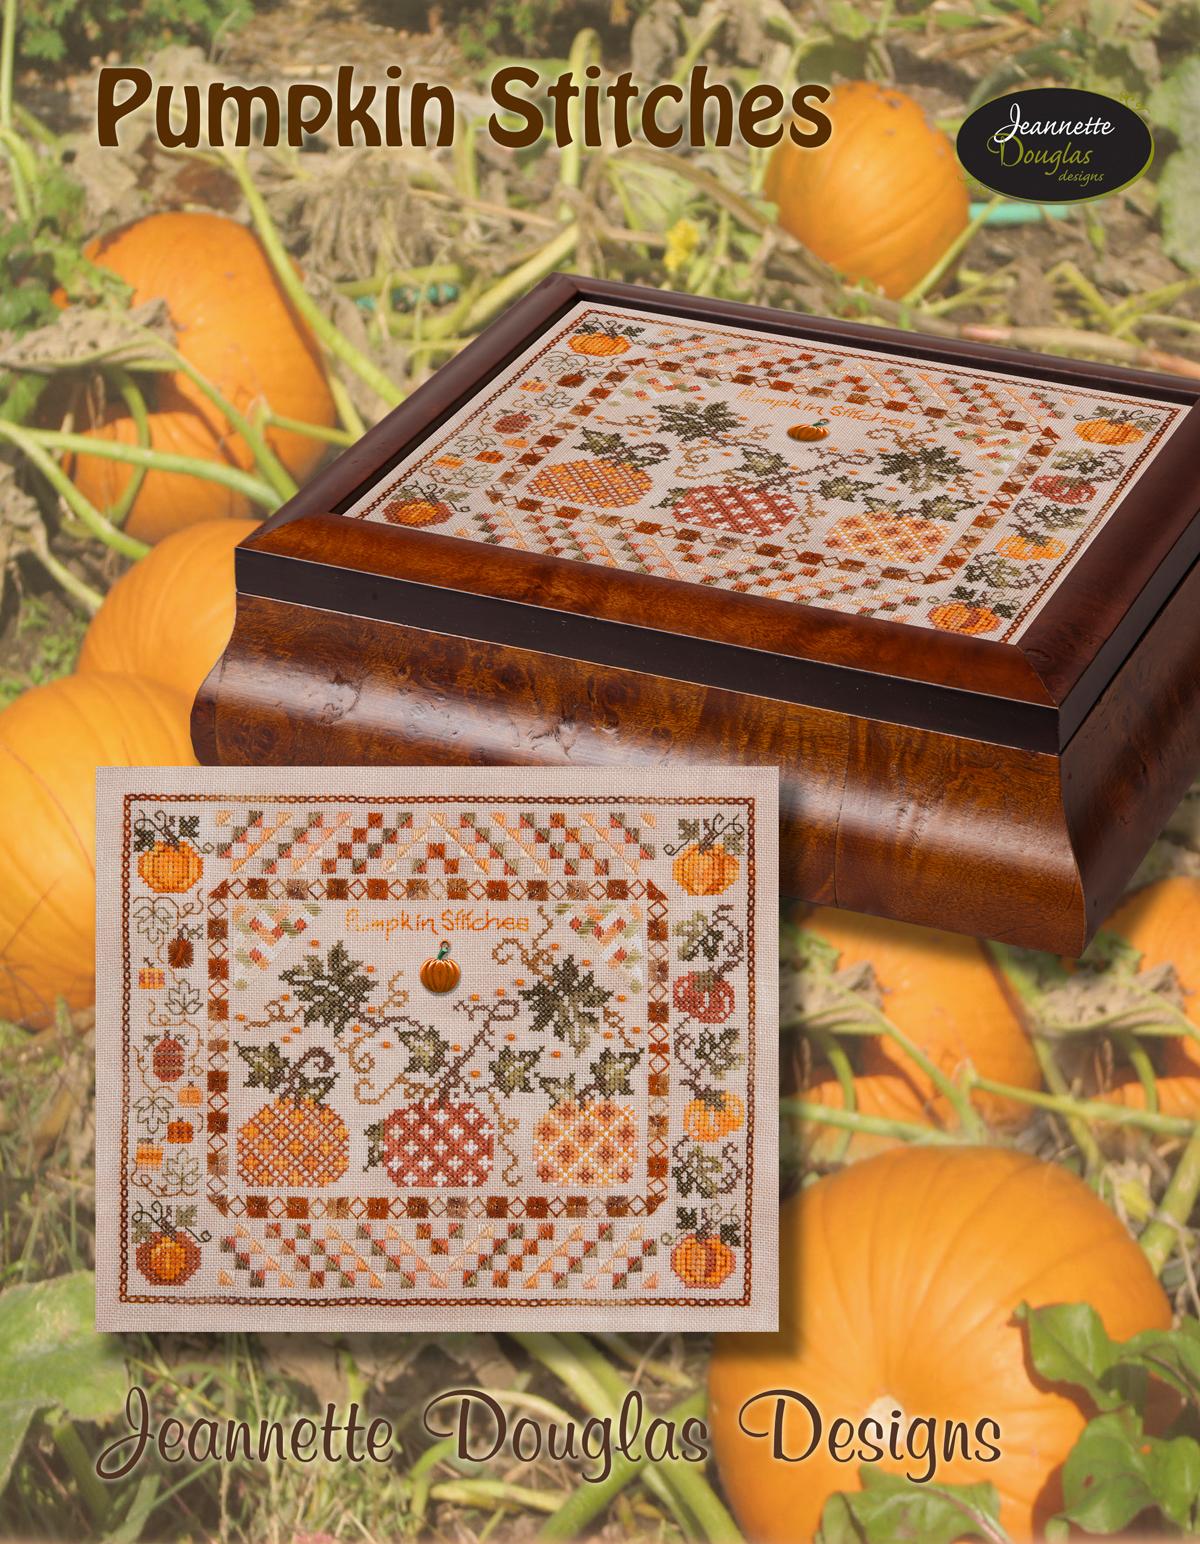 Pumpkin-Stitches-cover-web.jpg